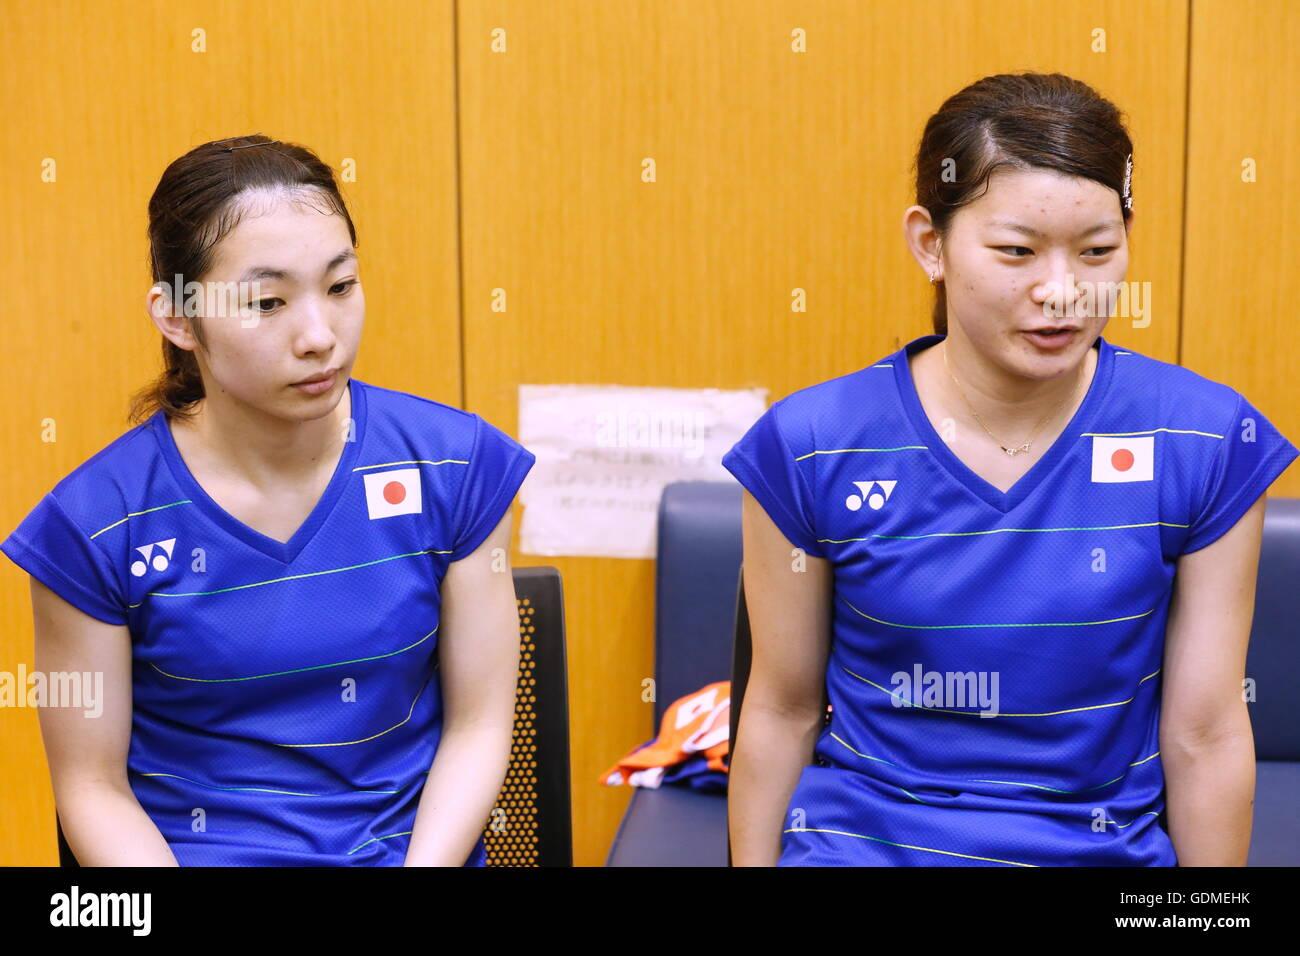 Tokyo Japan 19th July 2016 Ayaka Takahashi & Misaki Matsutomo